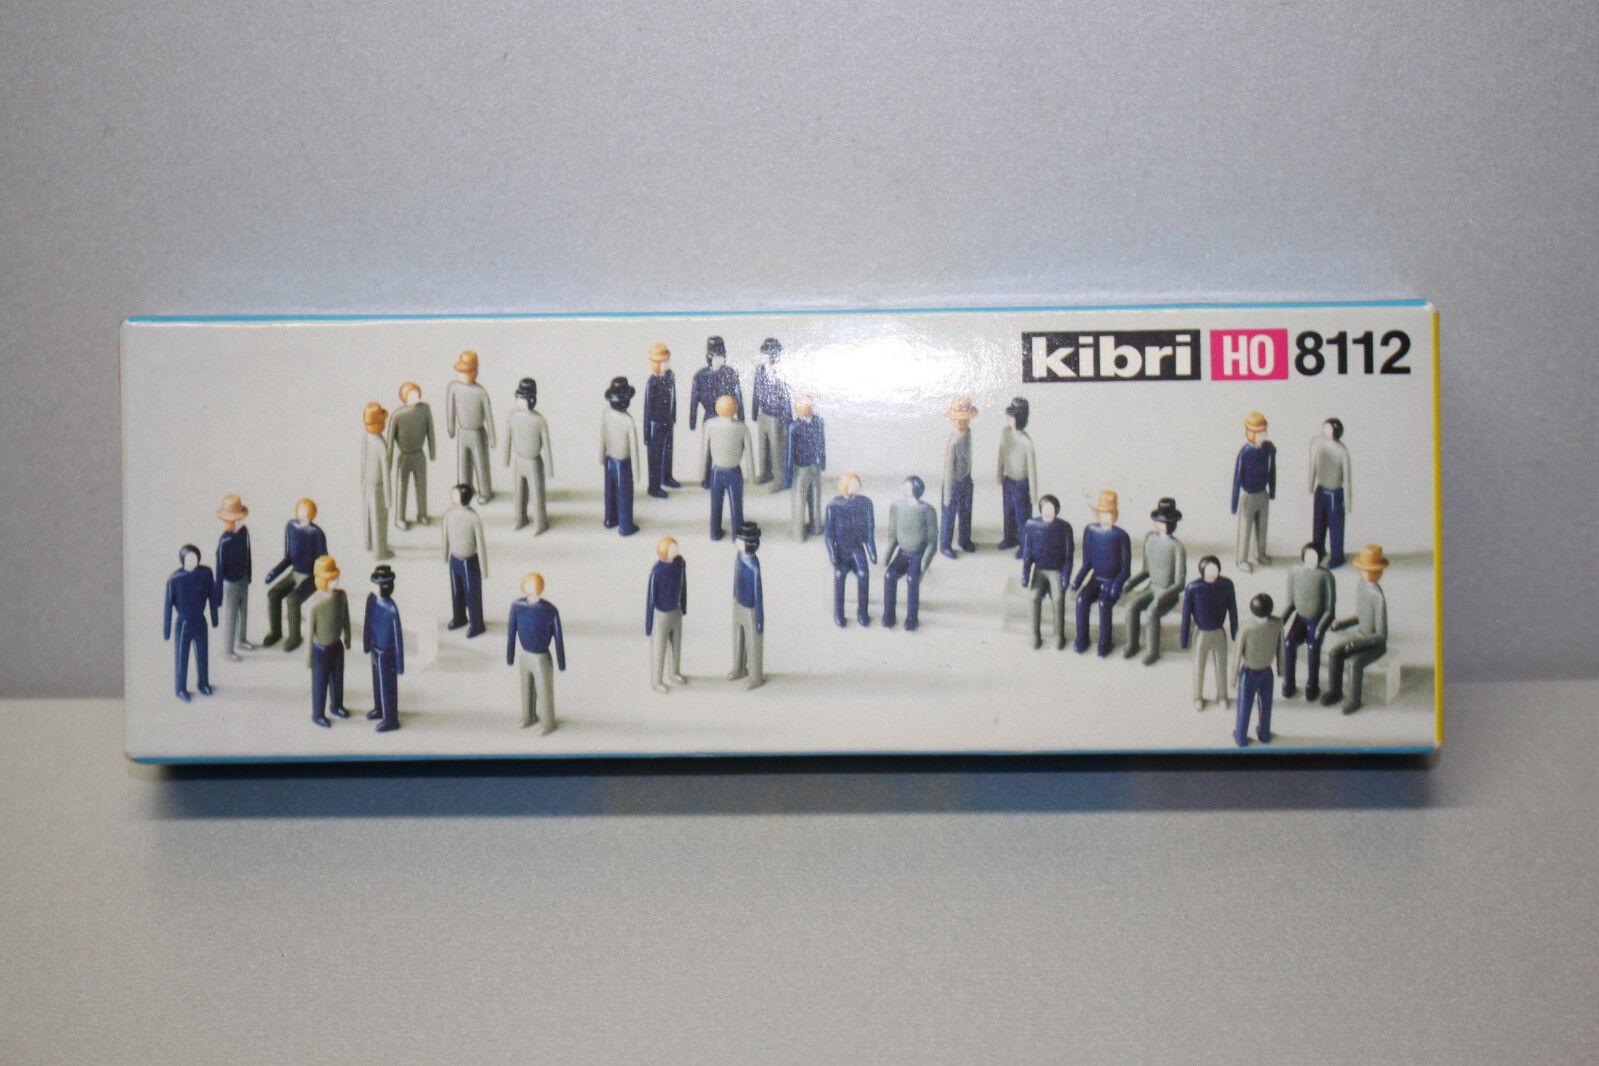 Kibri 8112 kit kit kit 32 figuras pista h0 OVP  más vendido